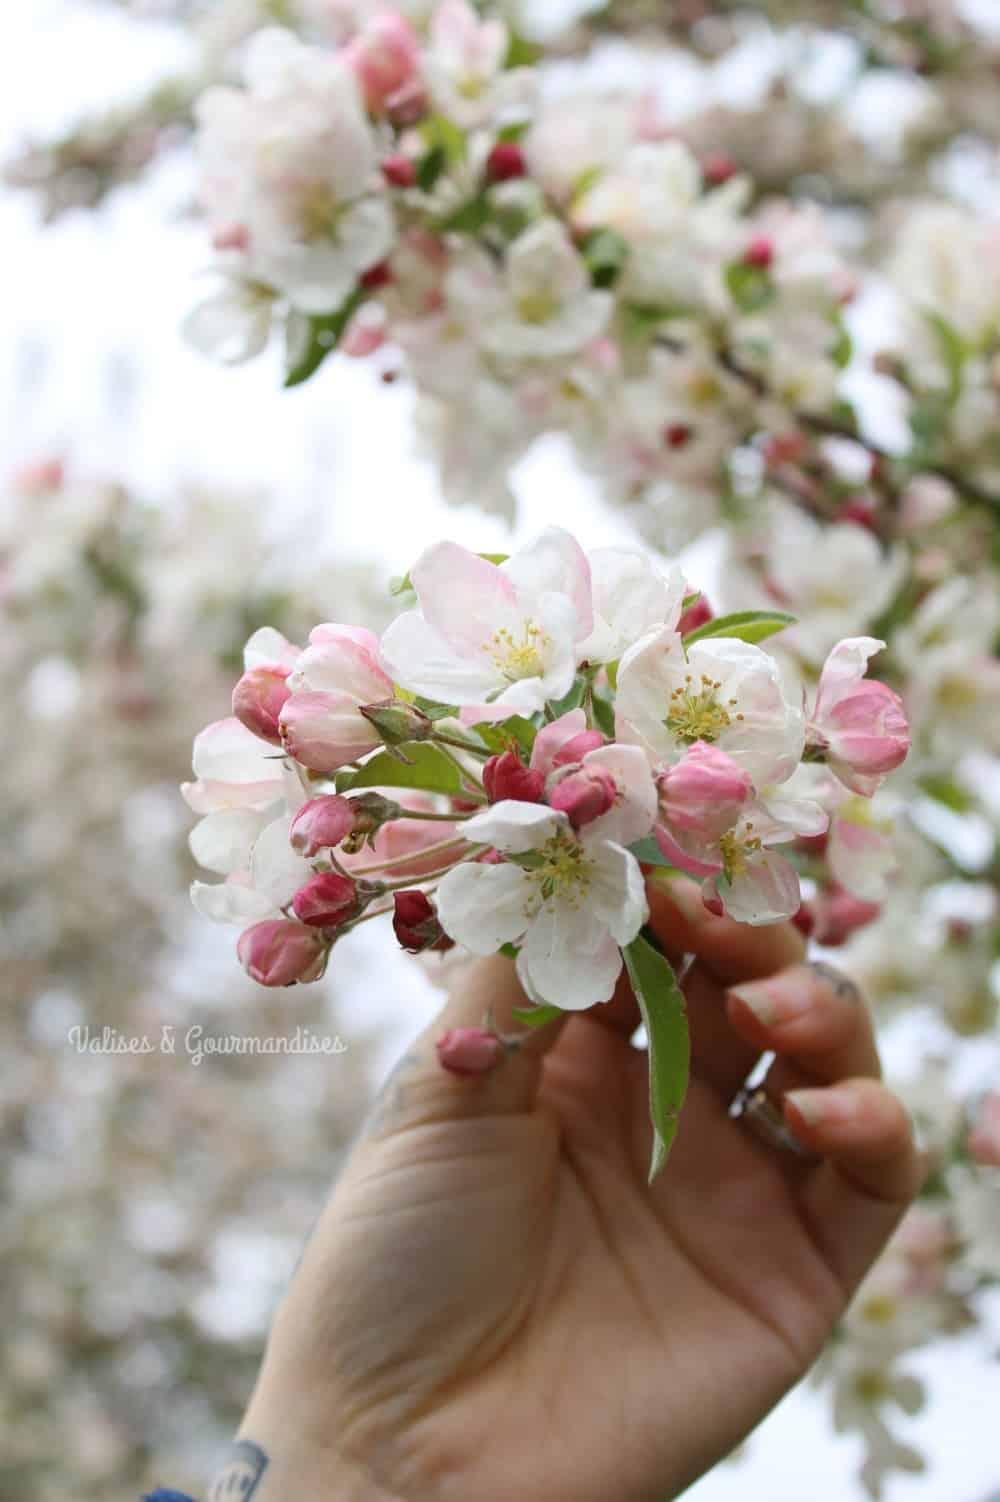 Cherry tree at Keukenhof garden, Netherlands